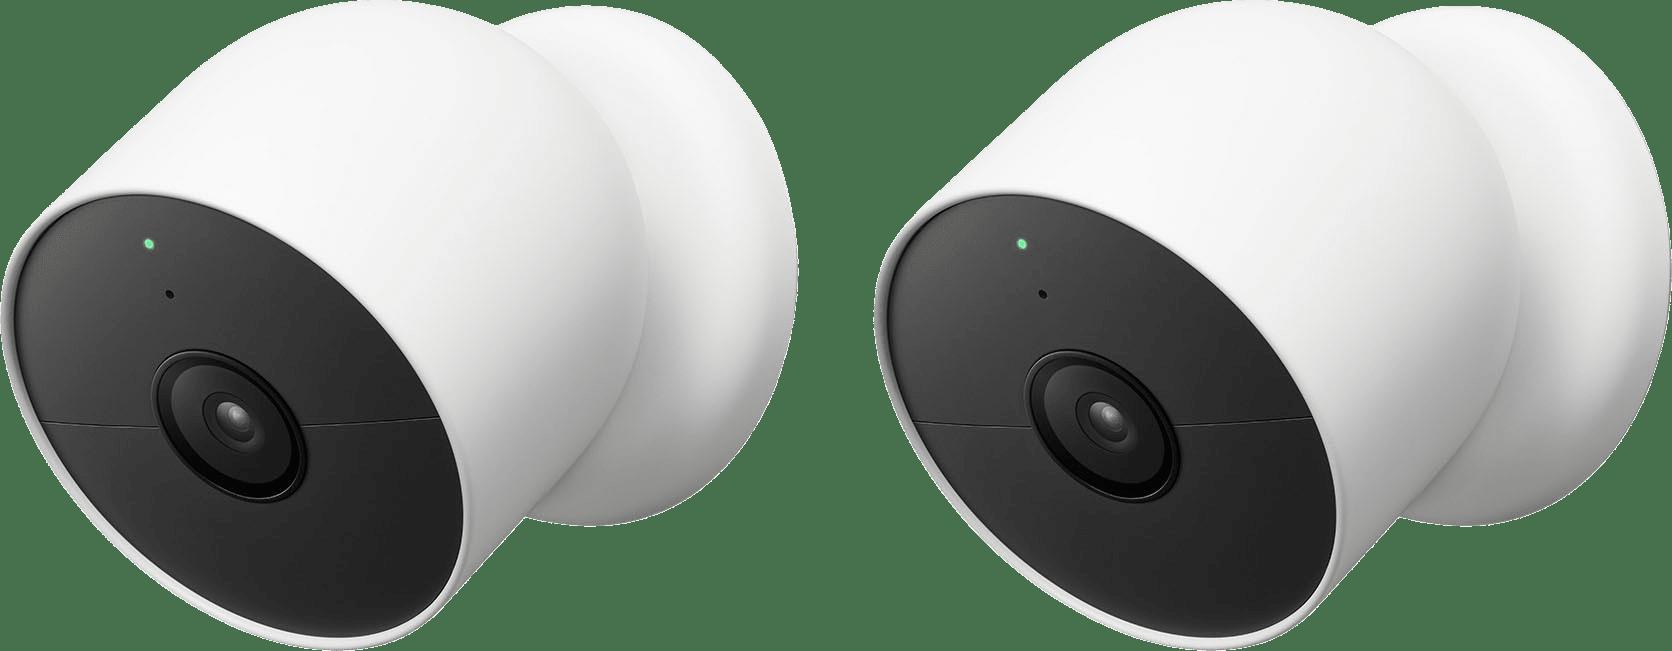 Google - Nest Camera Battery - 2 Pack